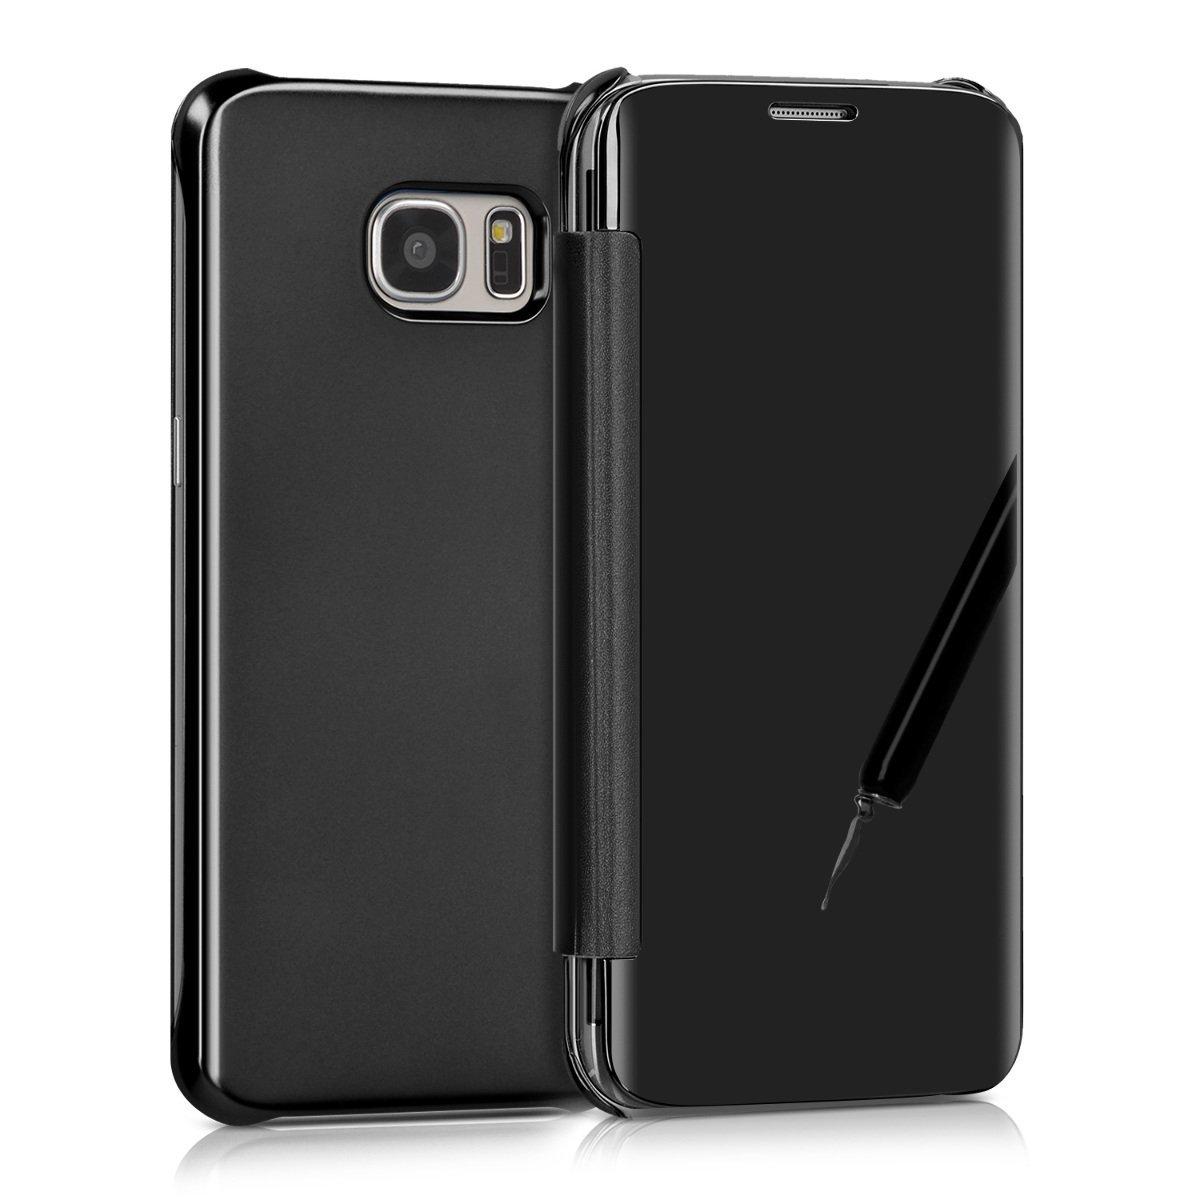 KW Mirror Flip Θήκη Samsung Galaxy S7 Edge - Black (40346.01)